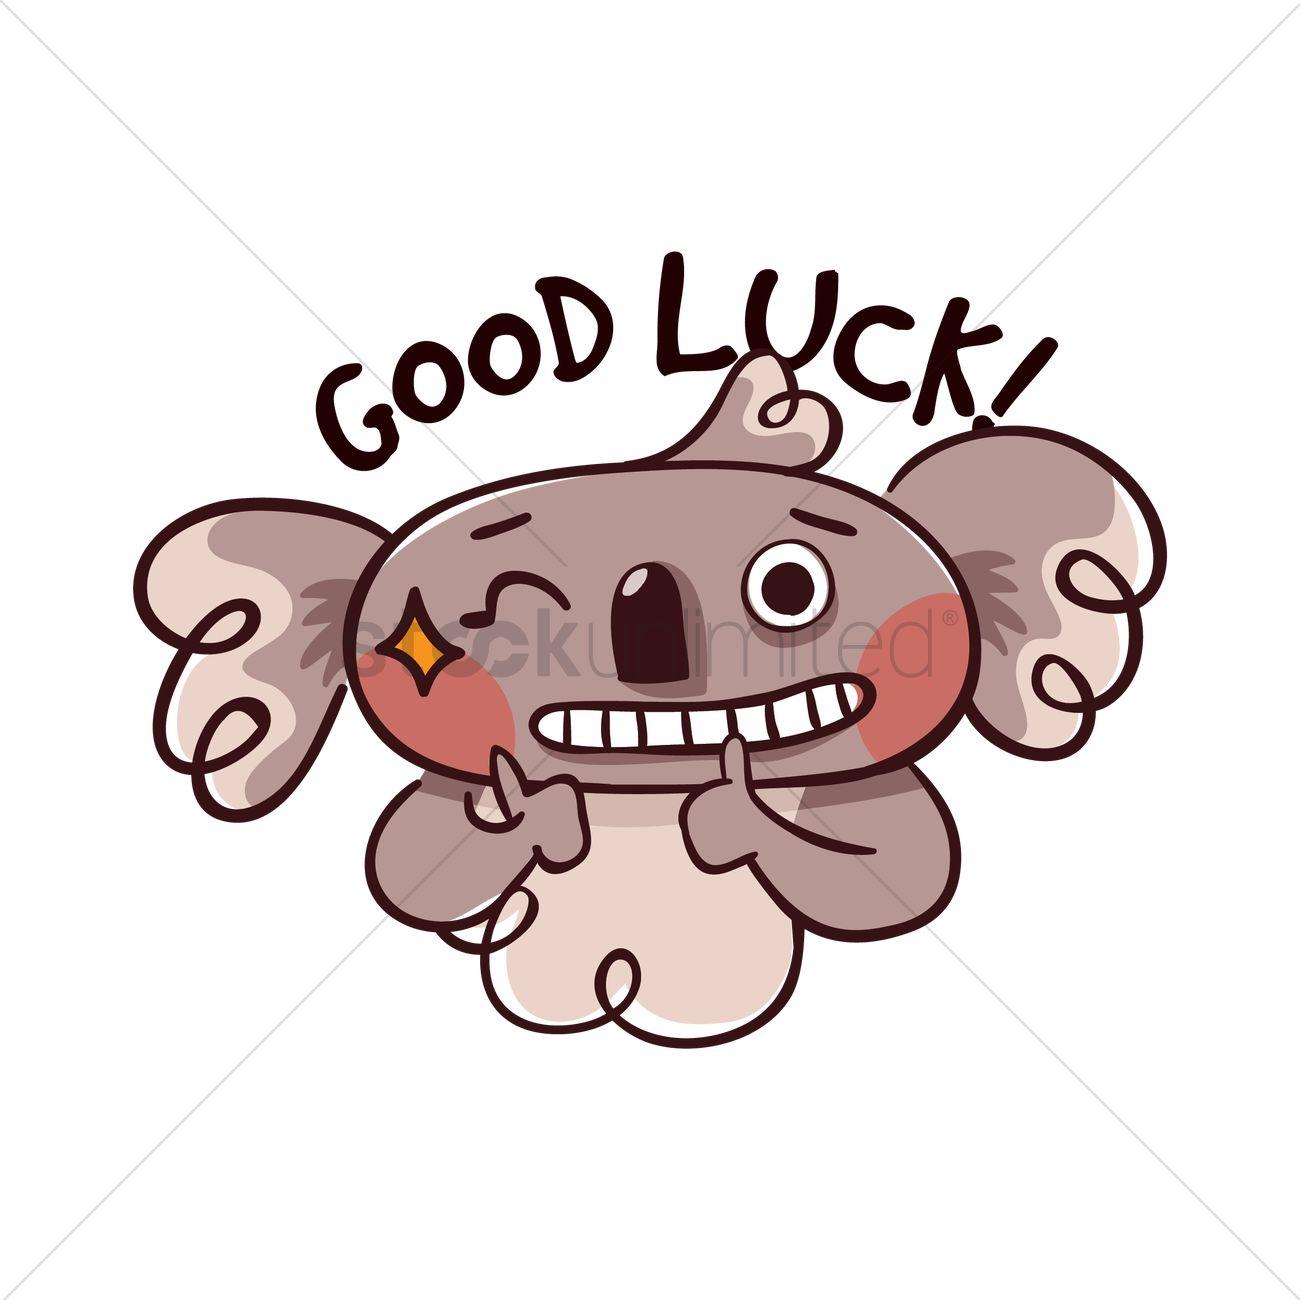 hight resolution of 1300x1300 good luck cartoons clip art clipart collection